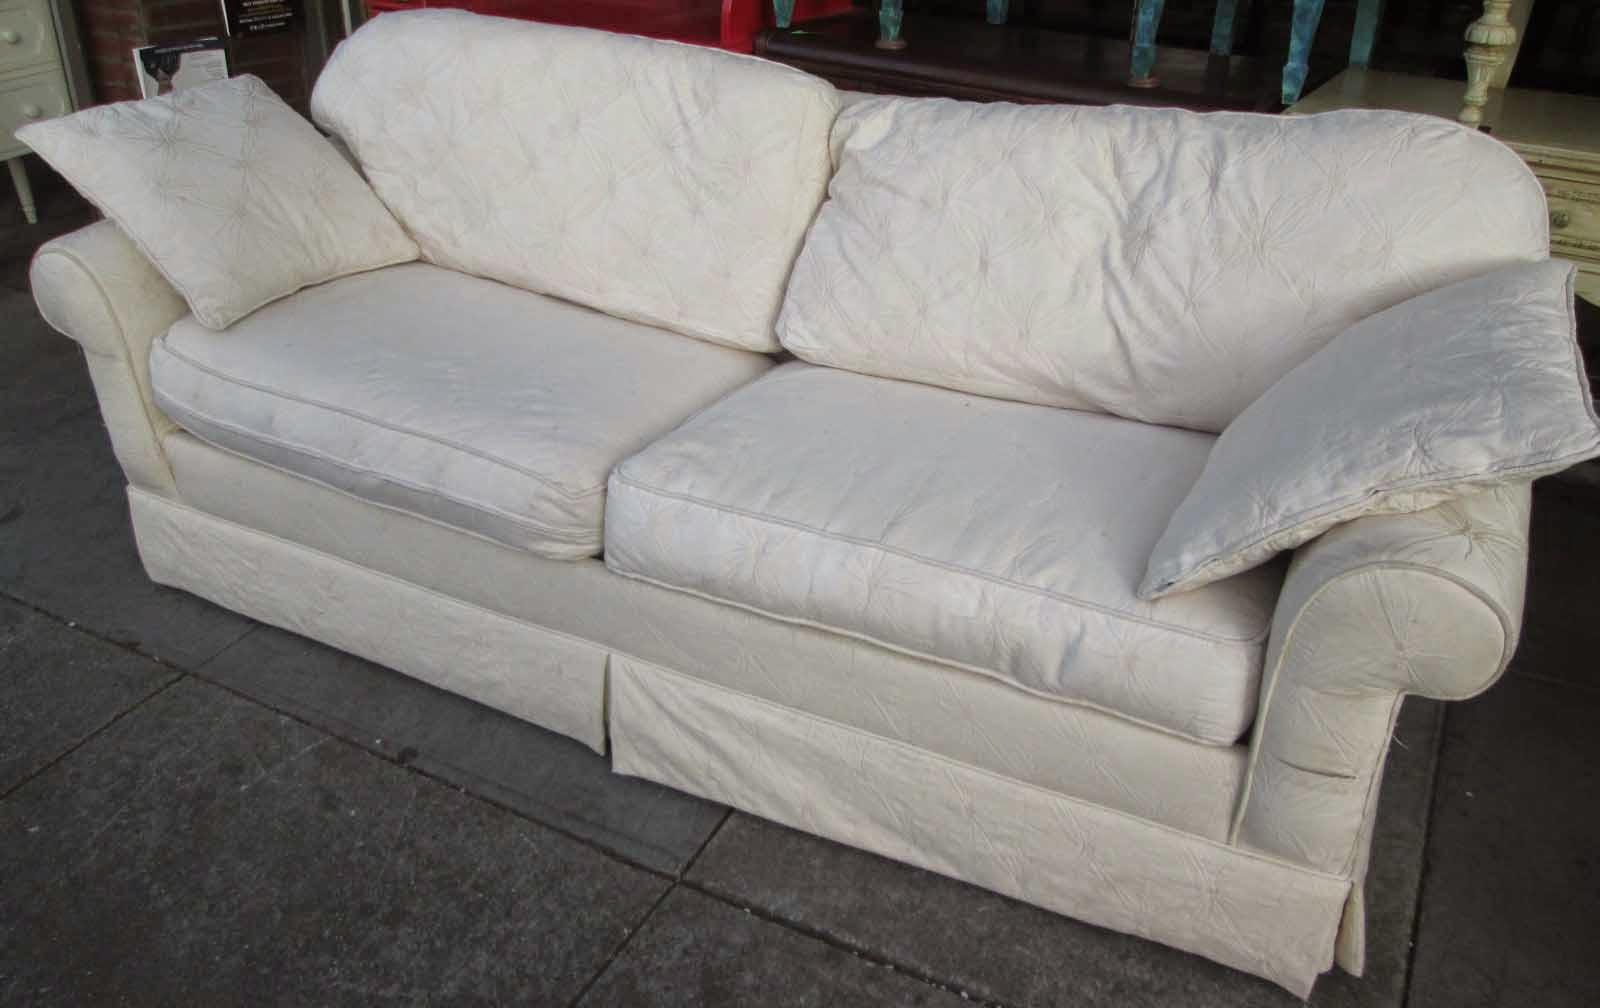 uhuru furniture collectibles sold white sofa sleeper 75